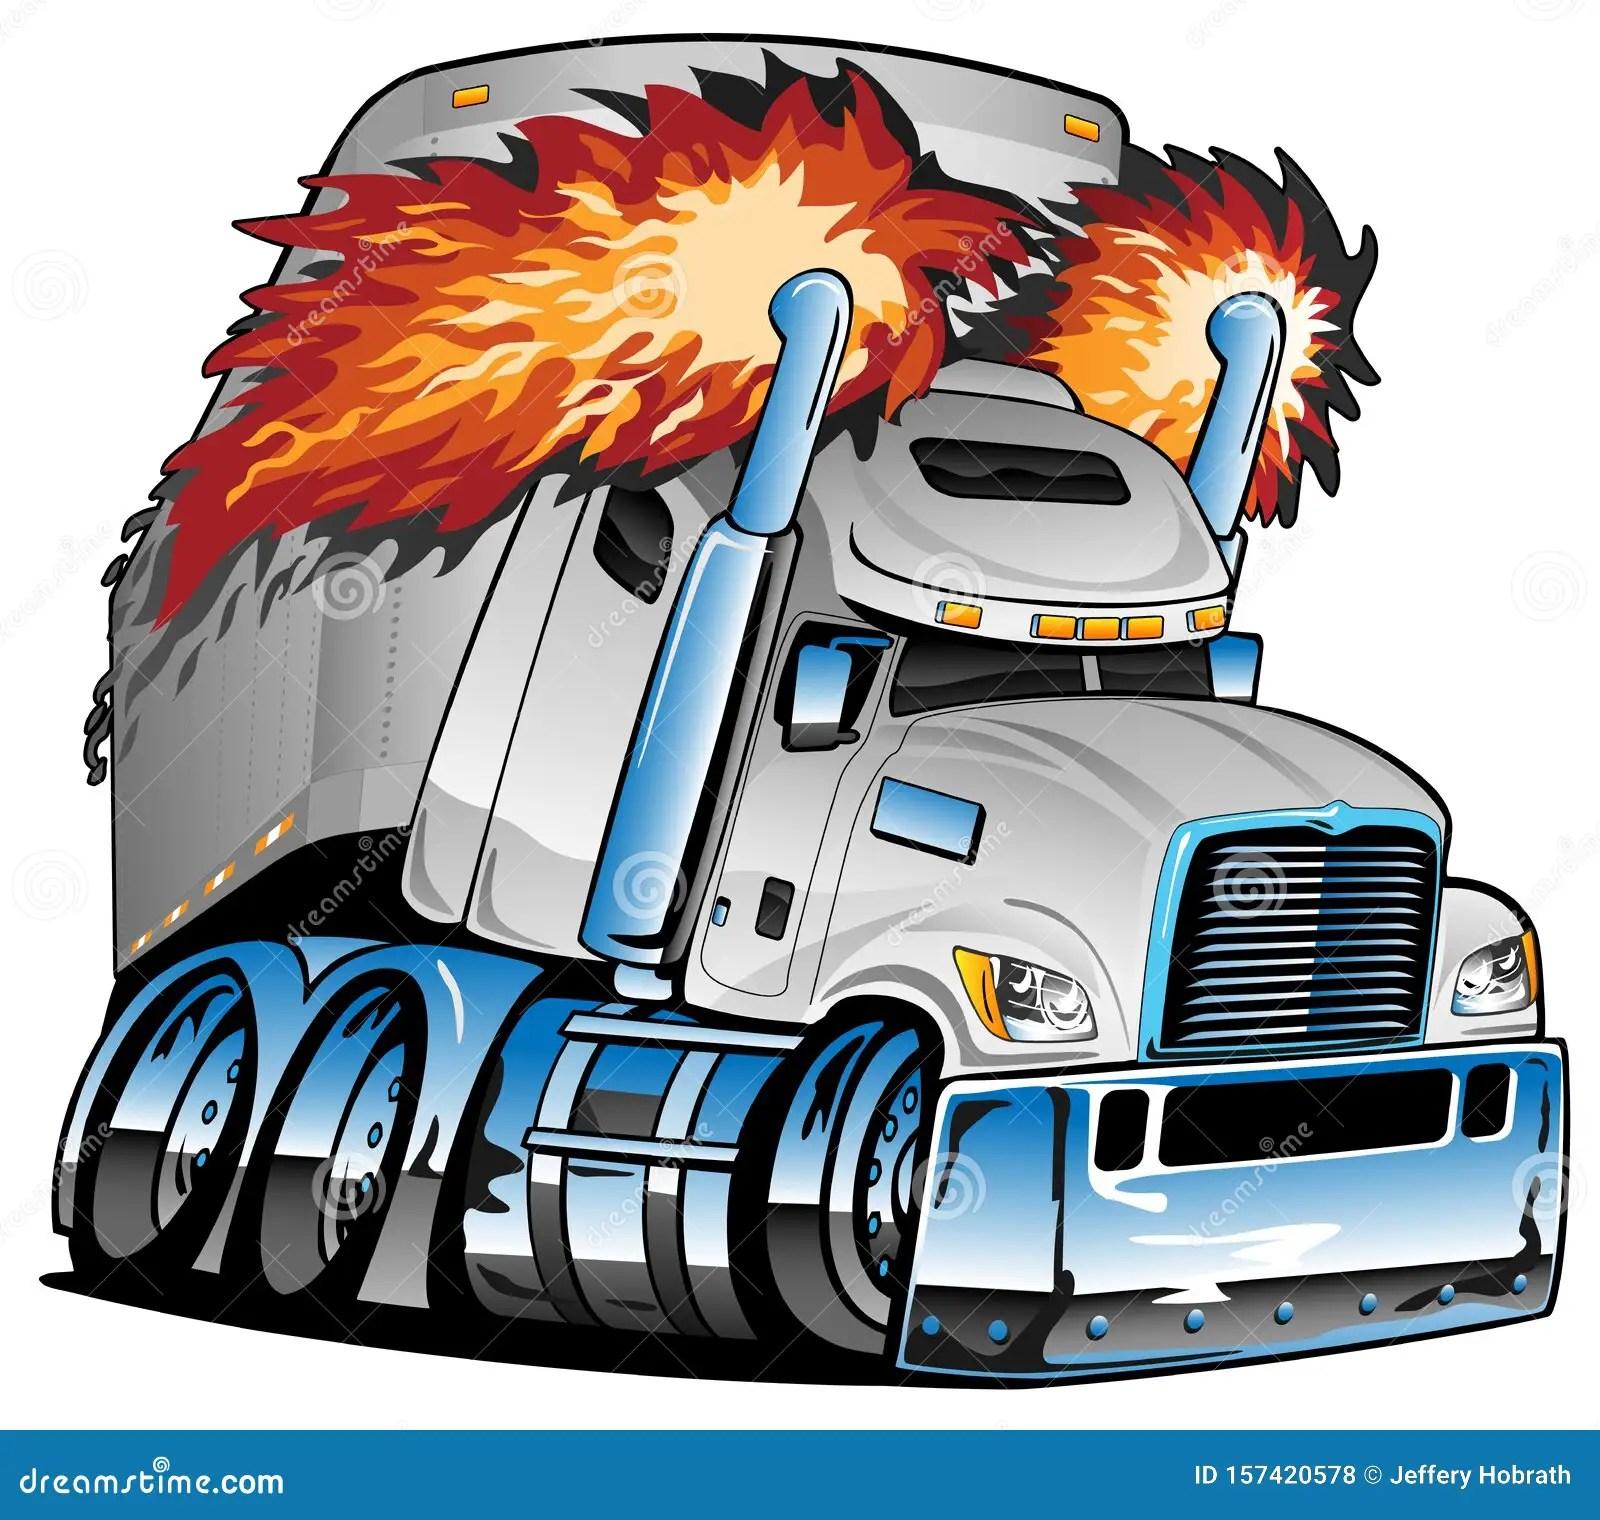 https www dreamstime com awesome big rig diesel tractor trailer cartoon illustration semi truck flames shooting huge smoke stacks tires rims image157420578